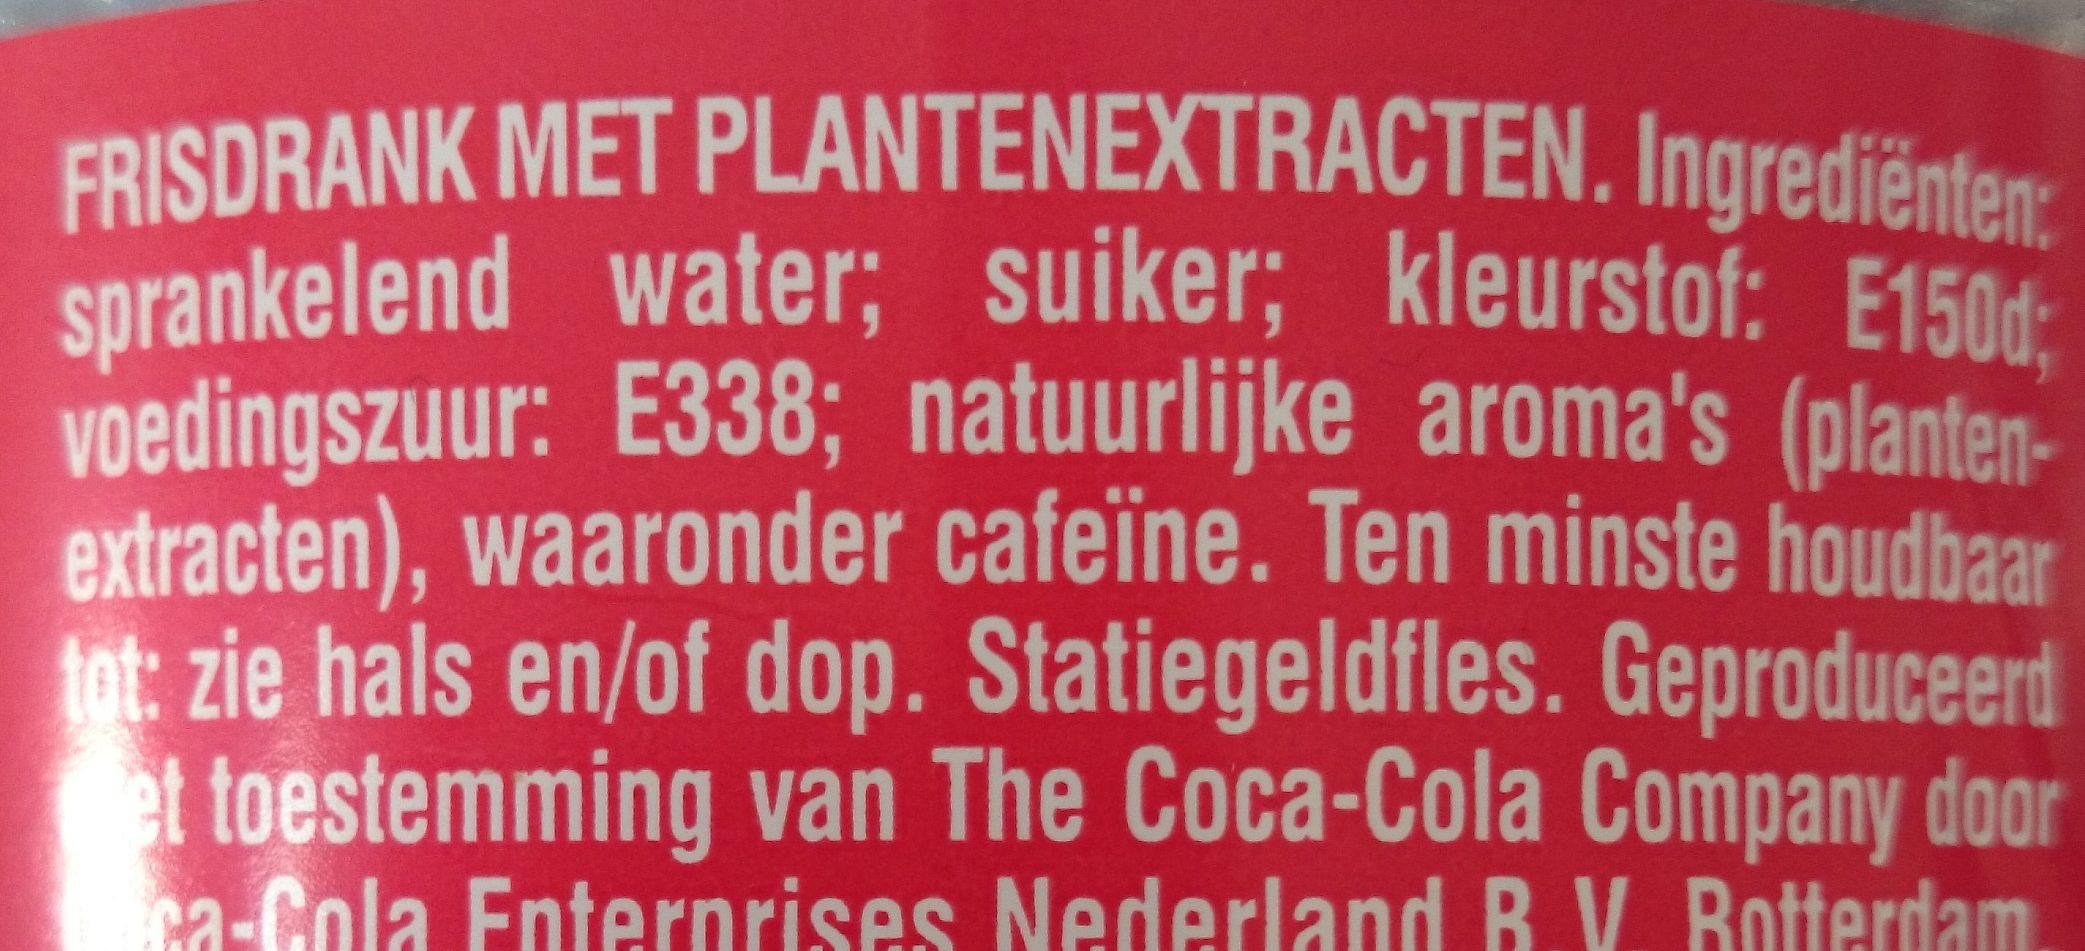 Cola Regular - Coca-cola - 1.5 Liters - Ingrediënten - nl